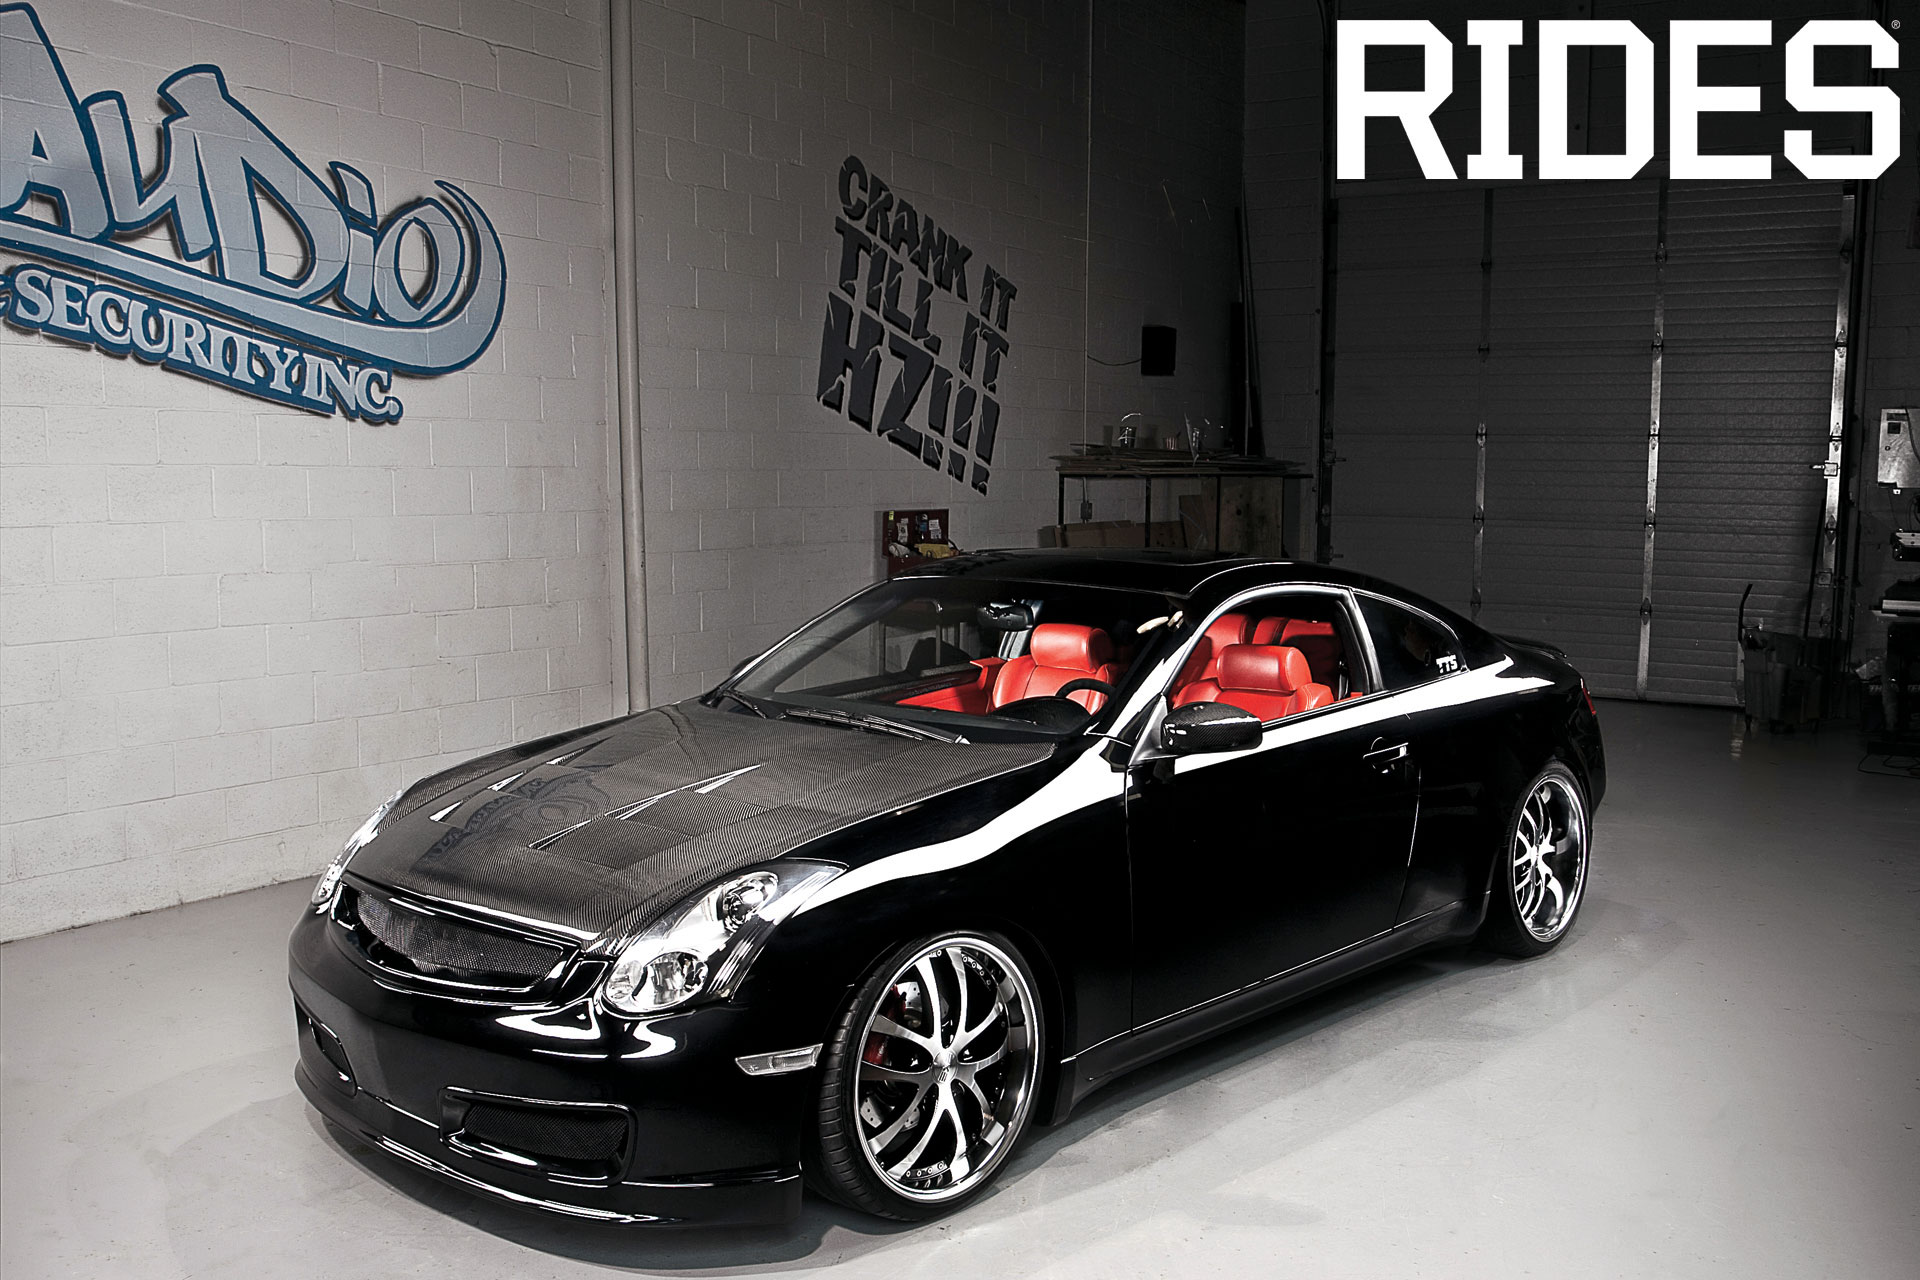 rides cars infiniti g35 20hz audio canada mr cleen